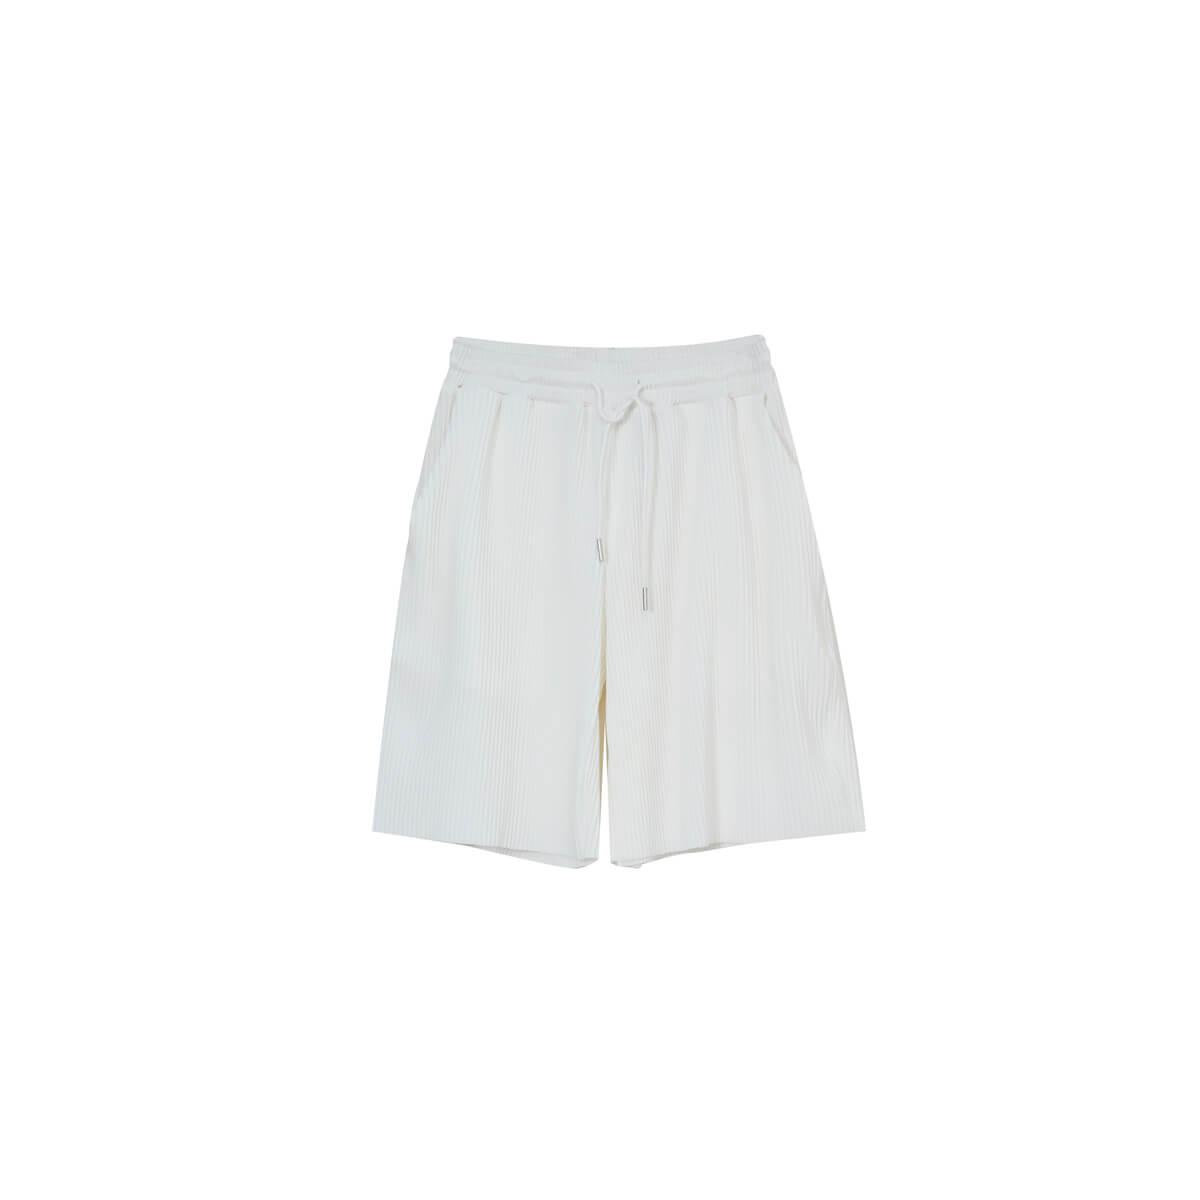 Шорты Cui Layout Studio Minimalist Vertical Striped Shorts White